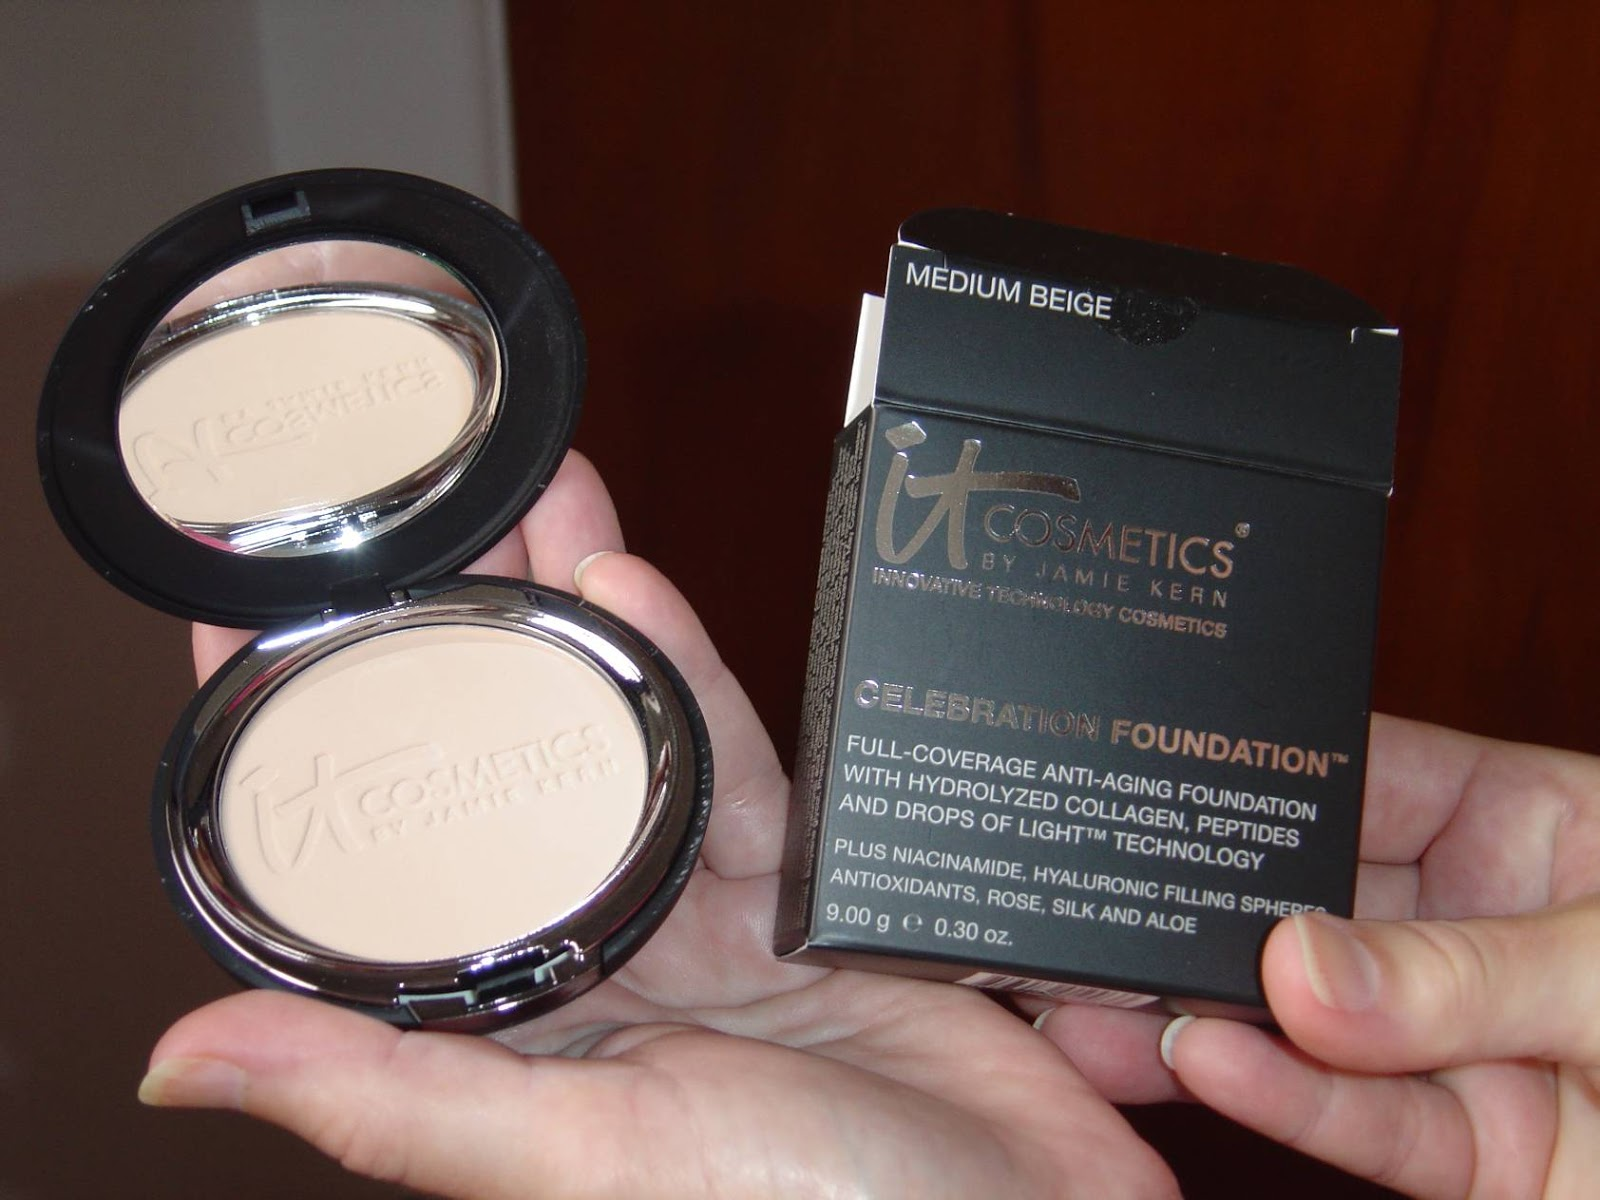 IT Cosmetics Celebration Foundation.jpeg